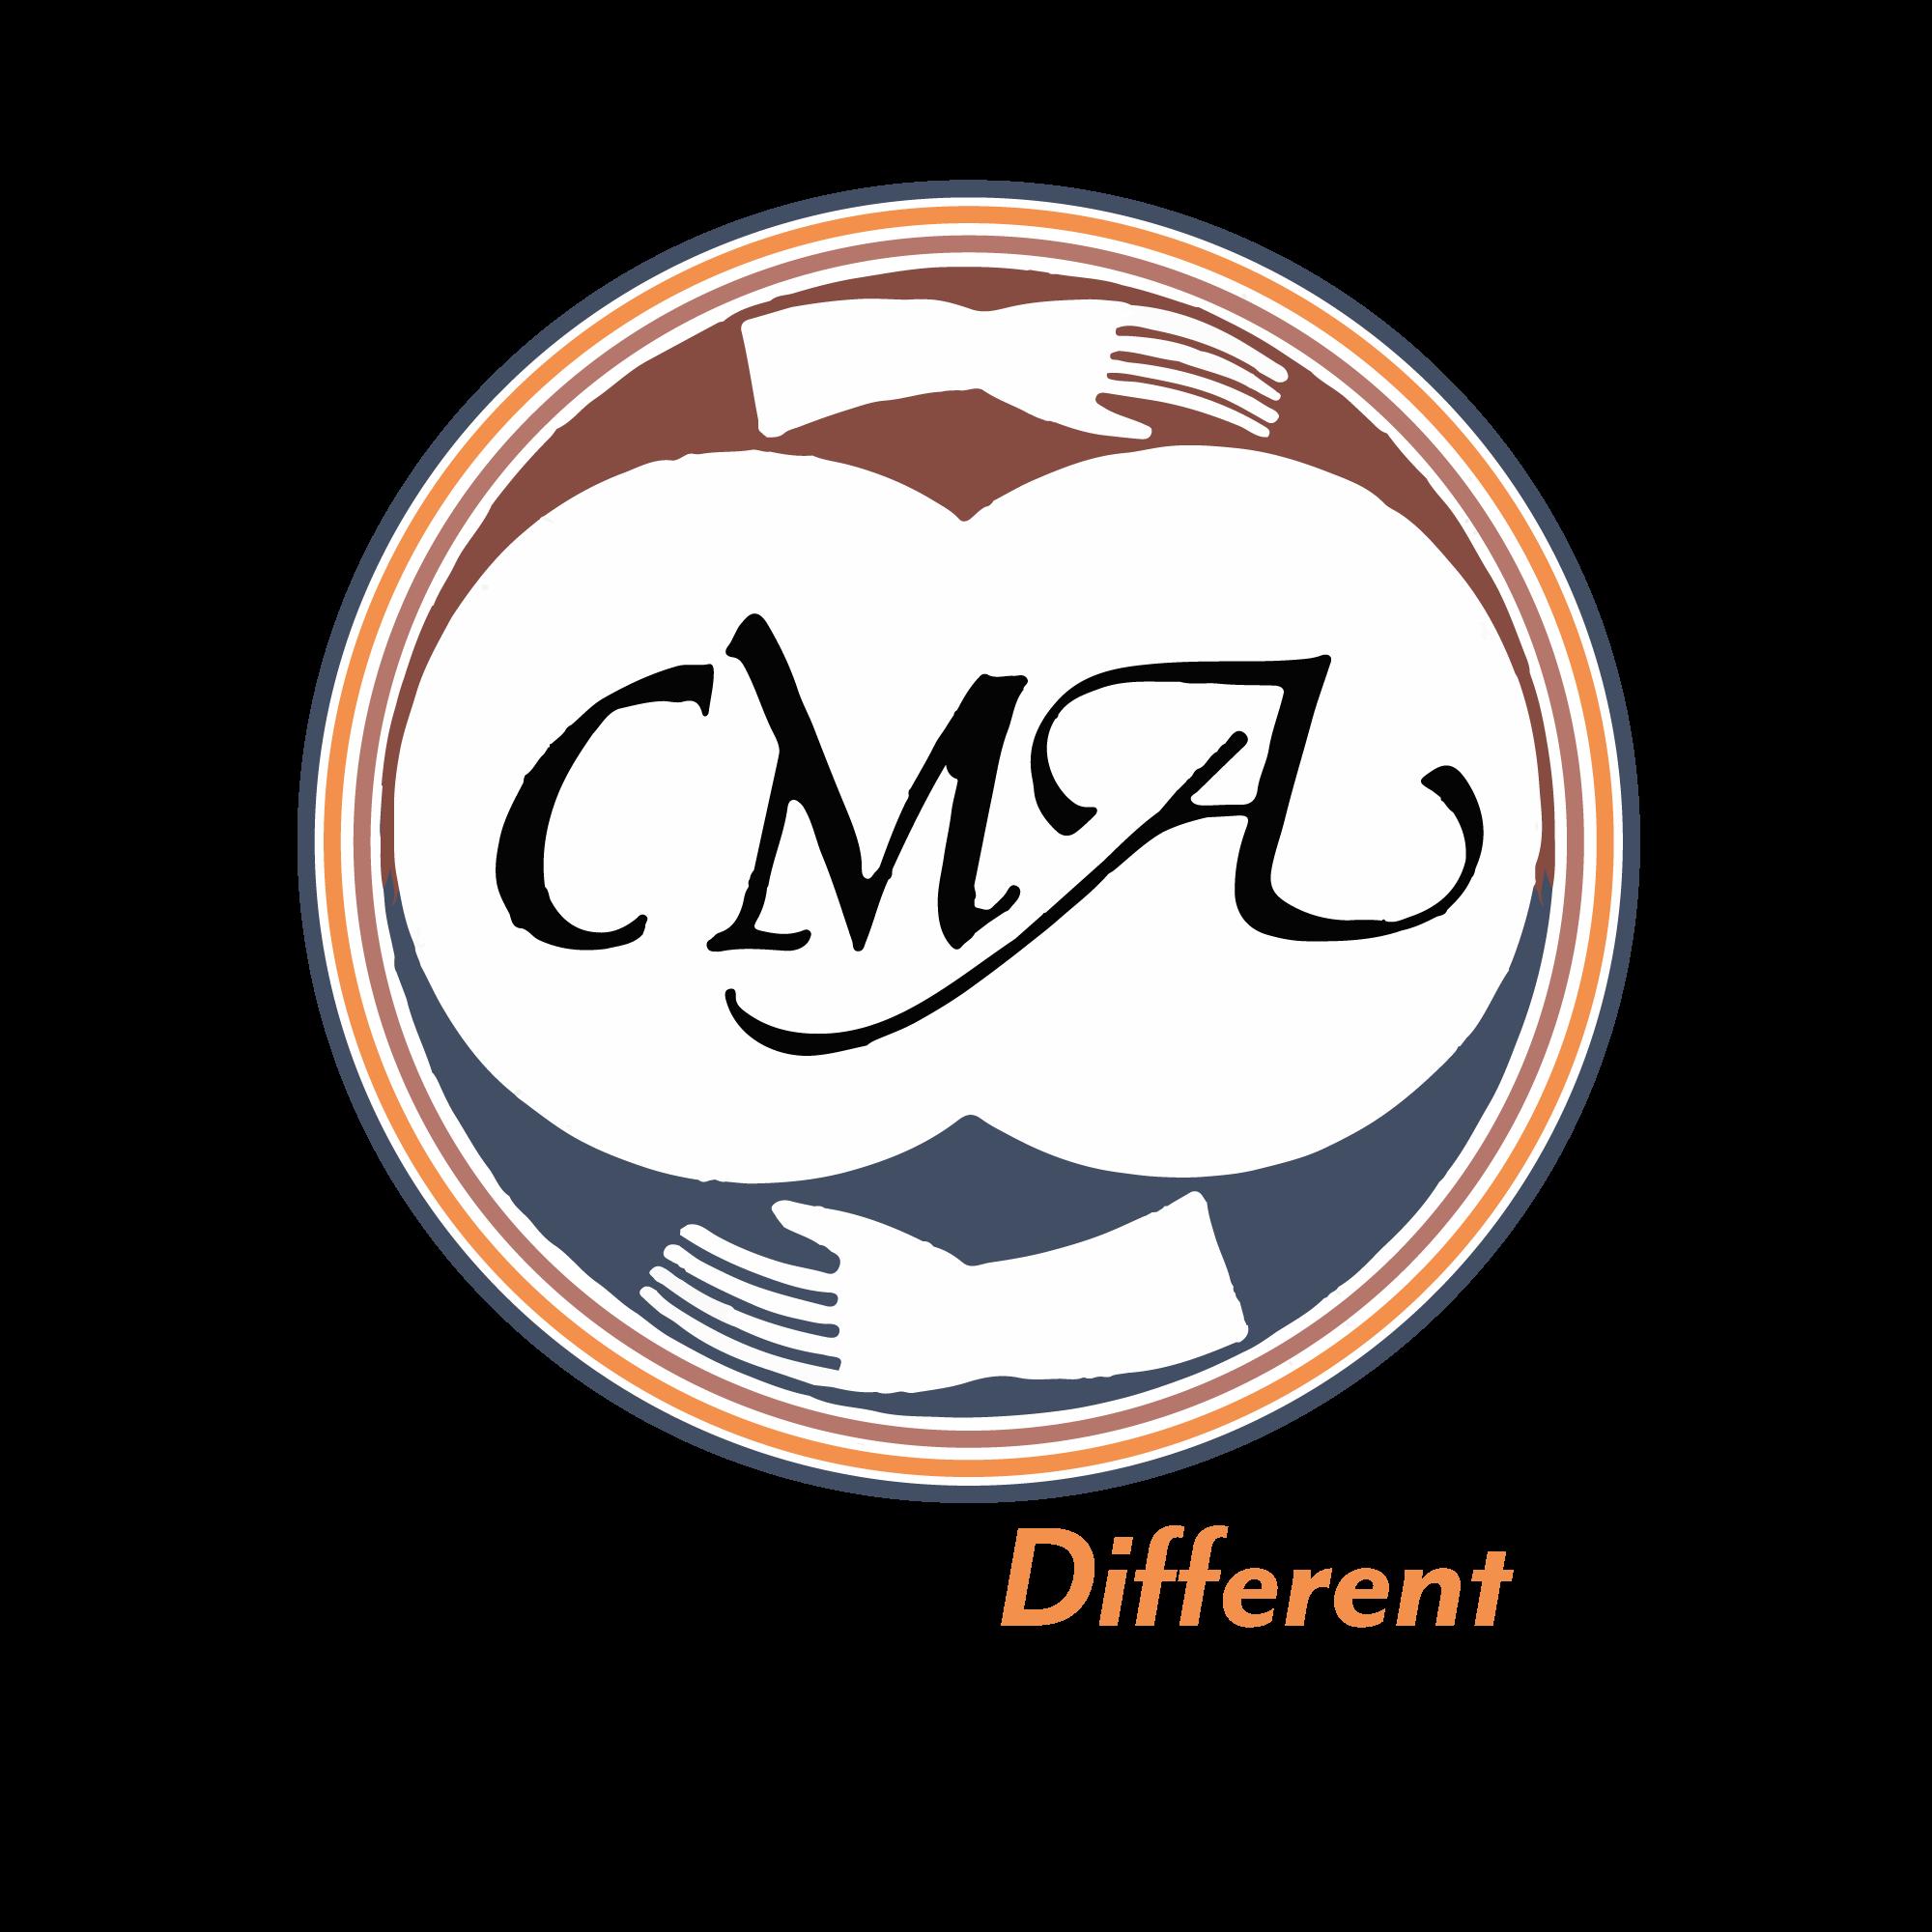 cma_logo_final.png